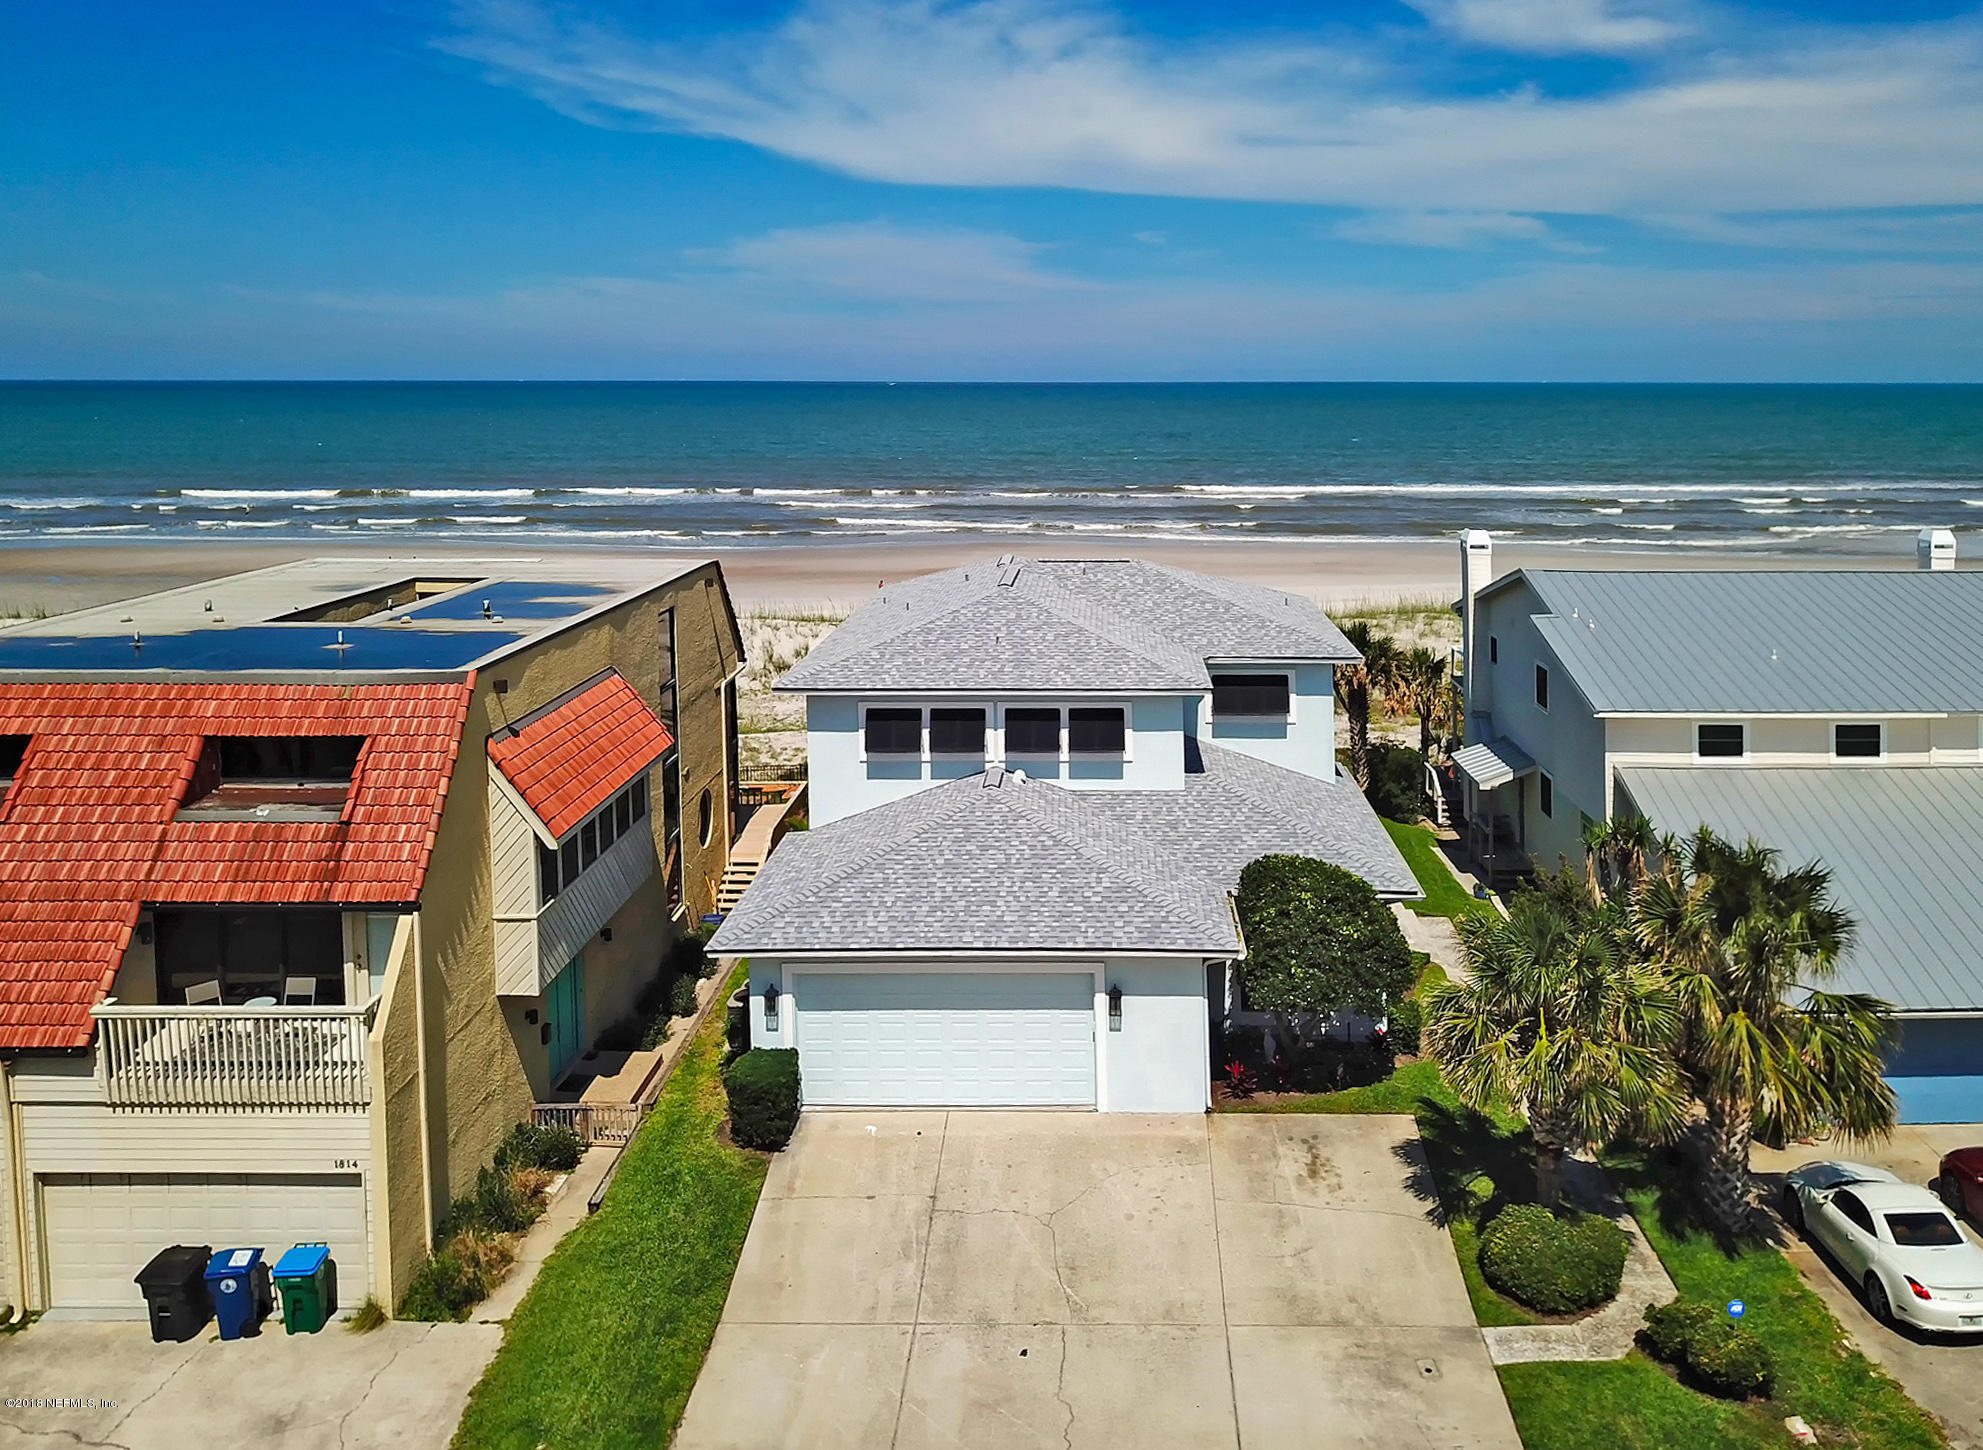 1820 OCEAN FRONT, NEPTUNE BEACH, FLORIDA 32266, 4 Bedrooms Bedrooms, ,4 BathroomsBathrooms,Residential - single family,For sale,OCEAN FRONT,935249